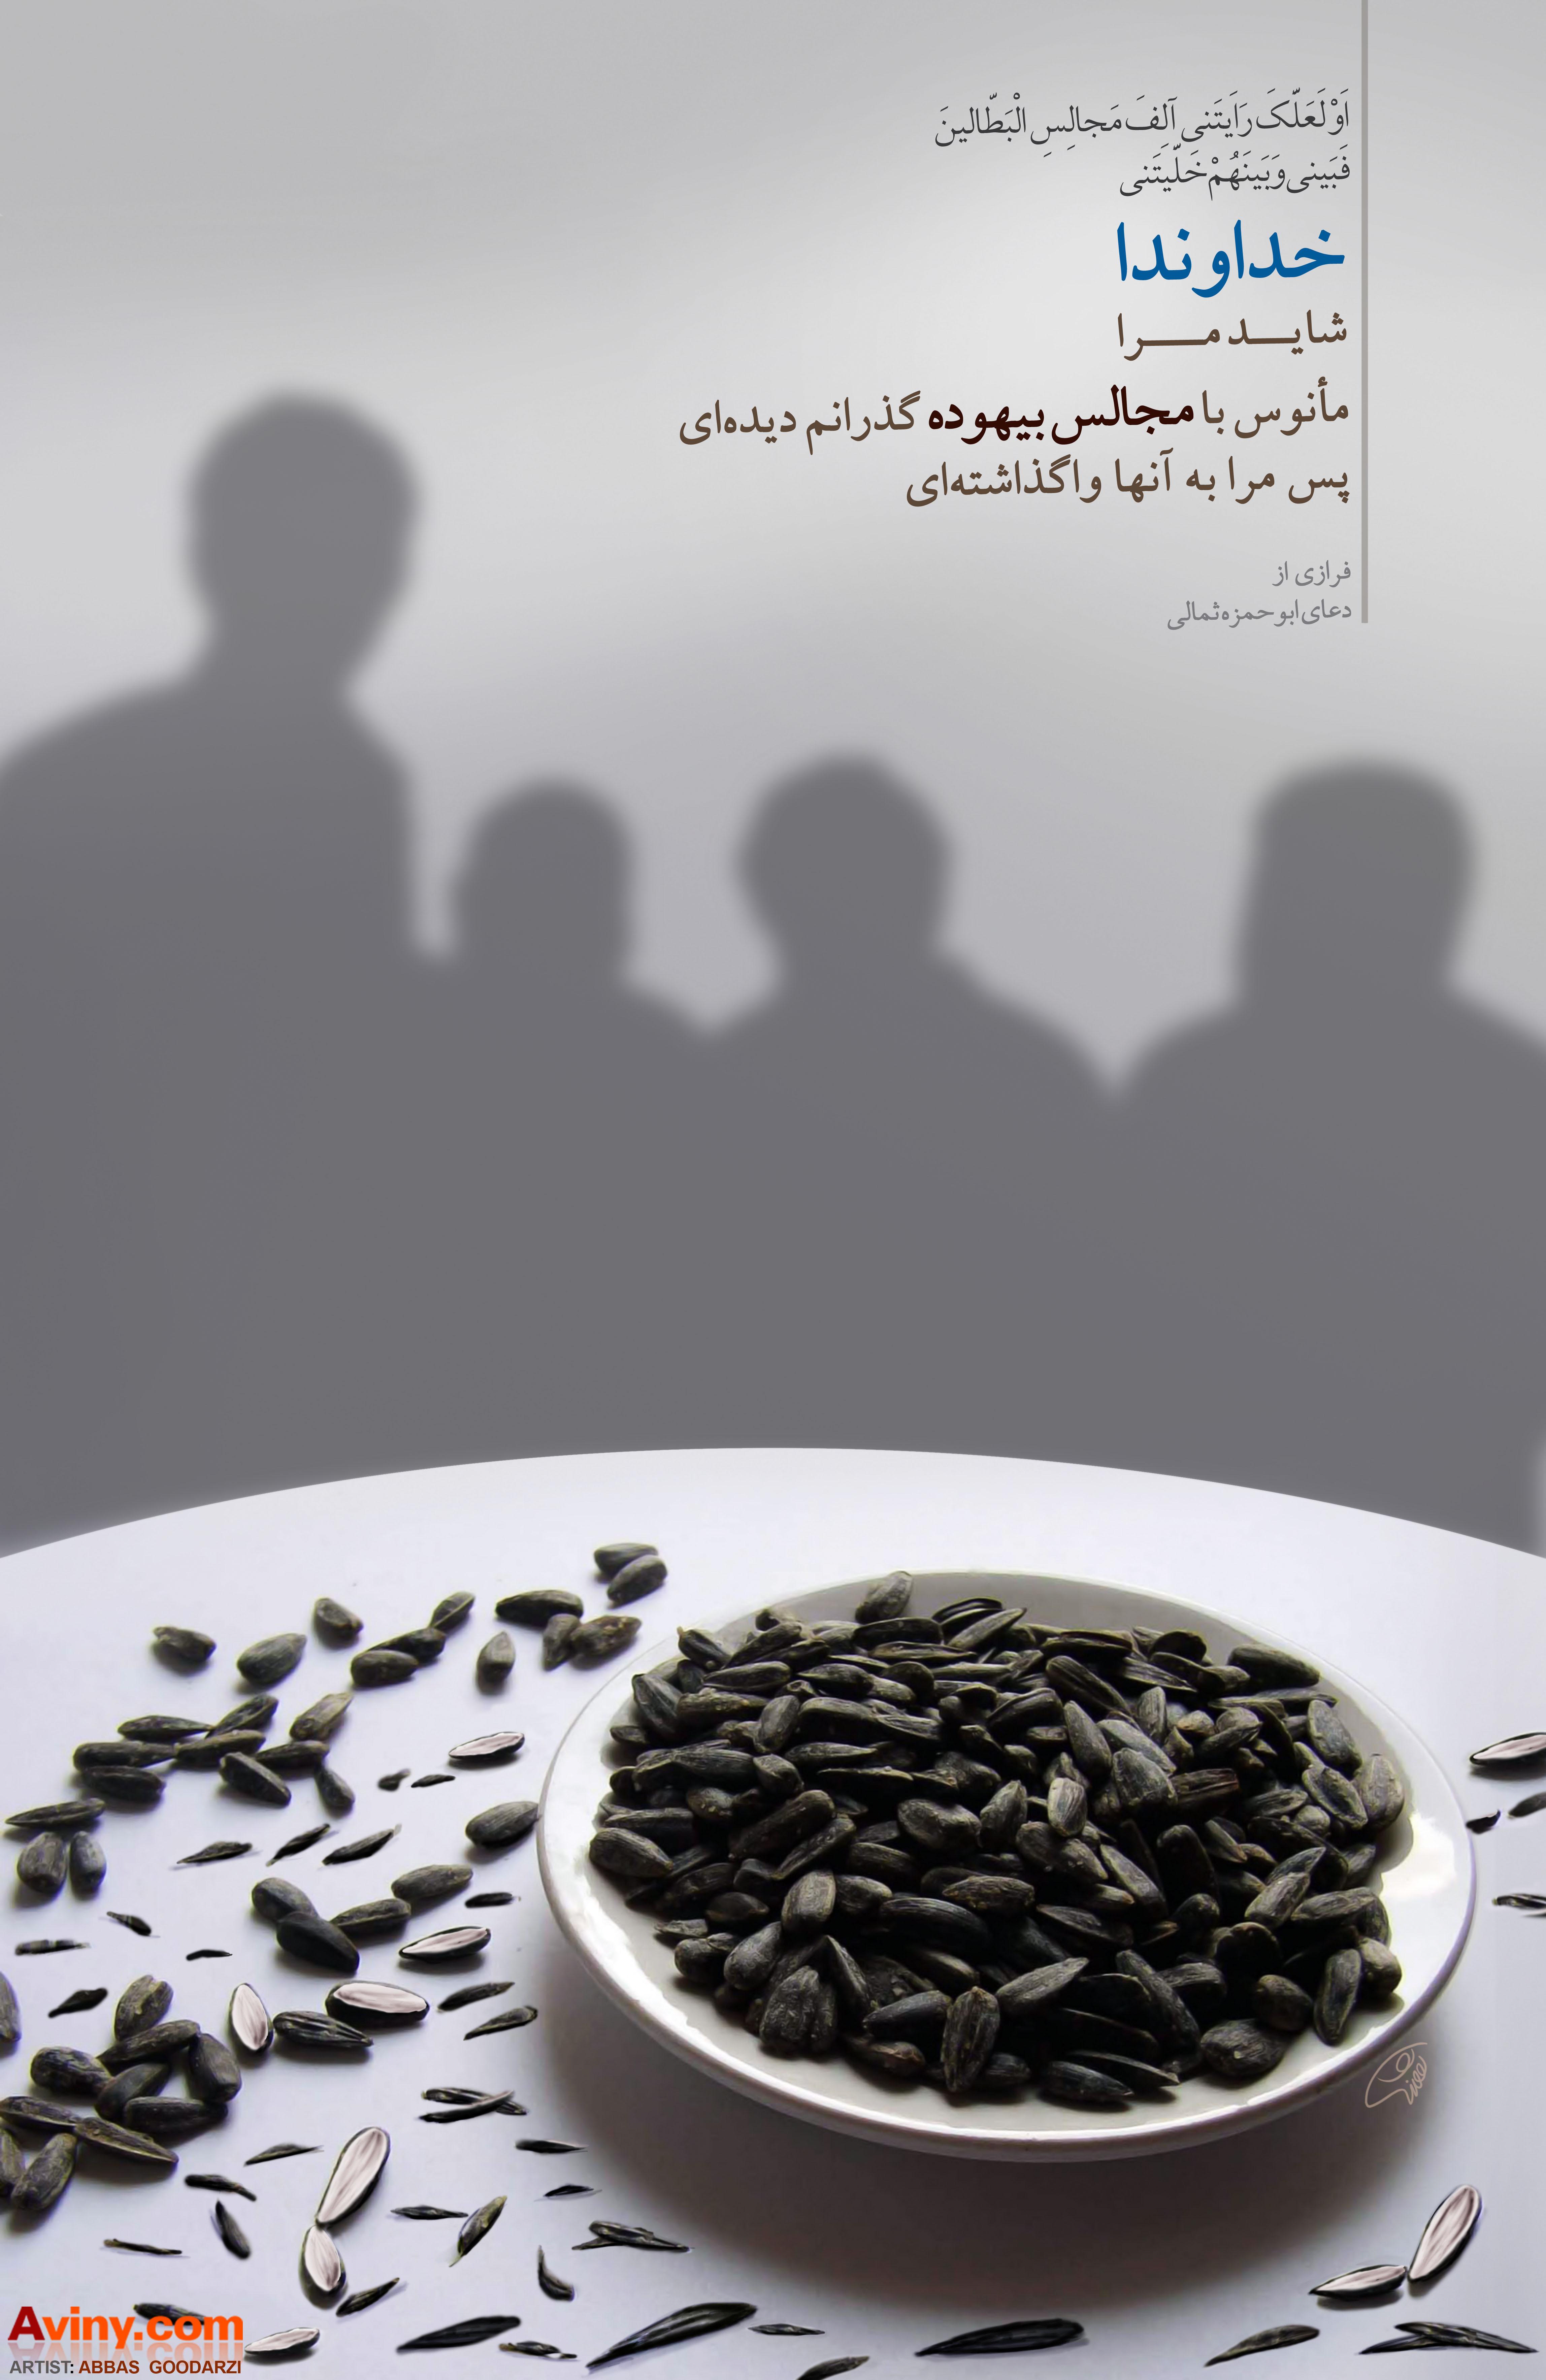 http://dl.aviny.com/Album/mazhabi/monasebat/ramezan/kamel/34.jpg